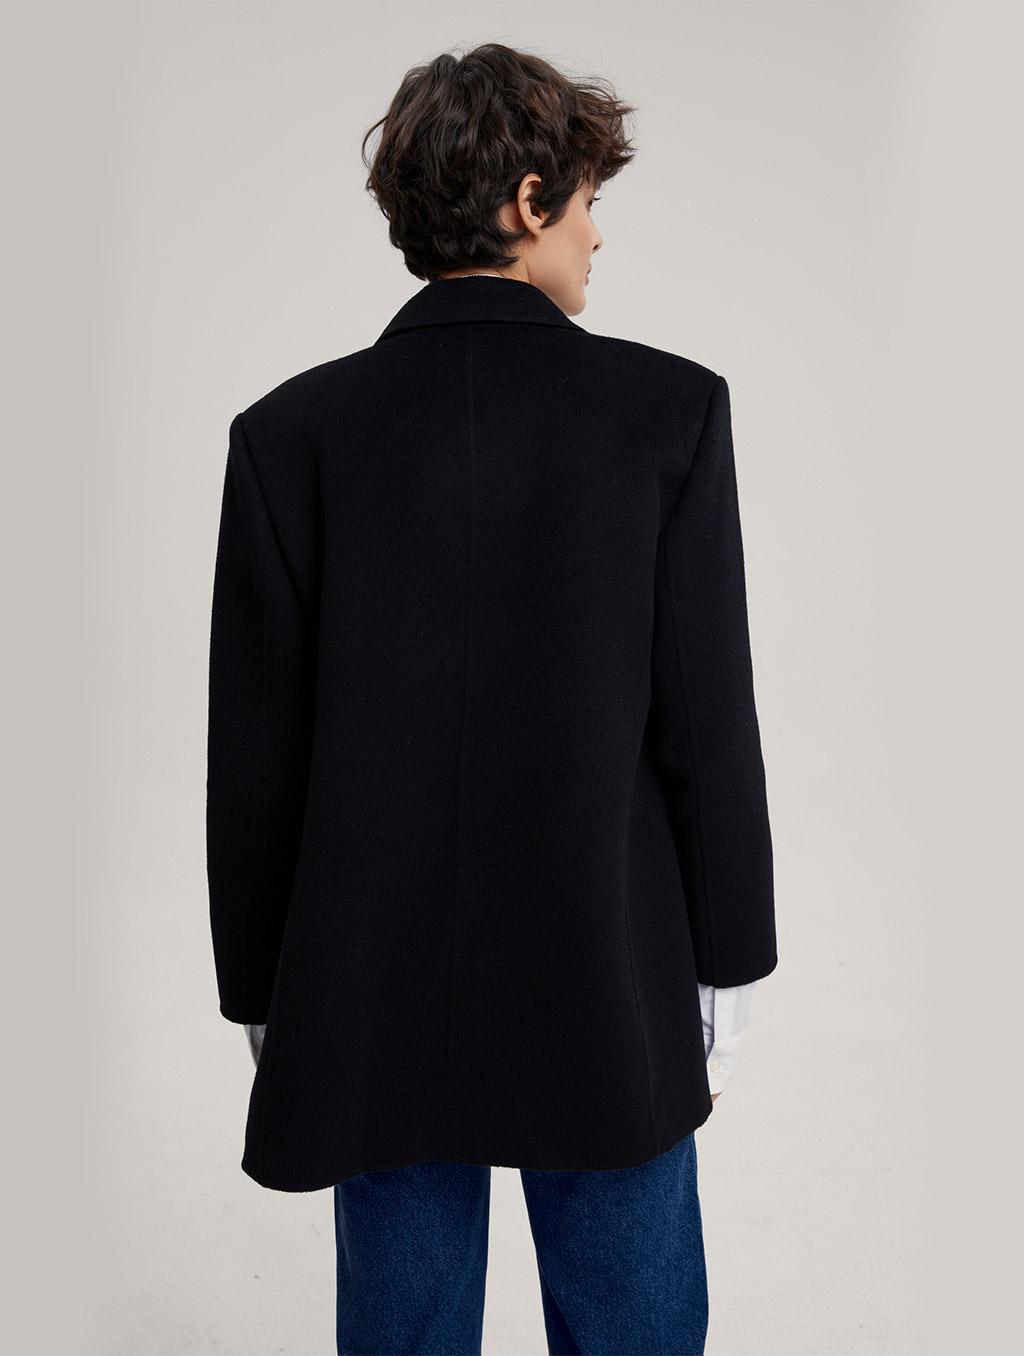 Waisted 100% Camel Hair Coat With Badge-back-black